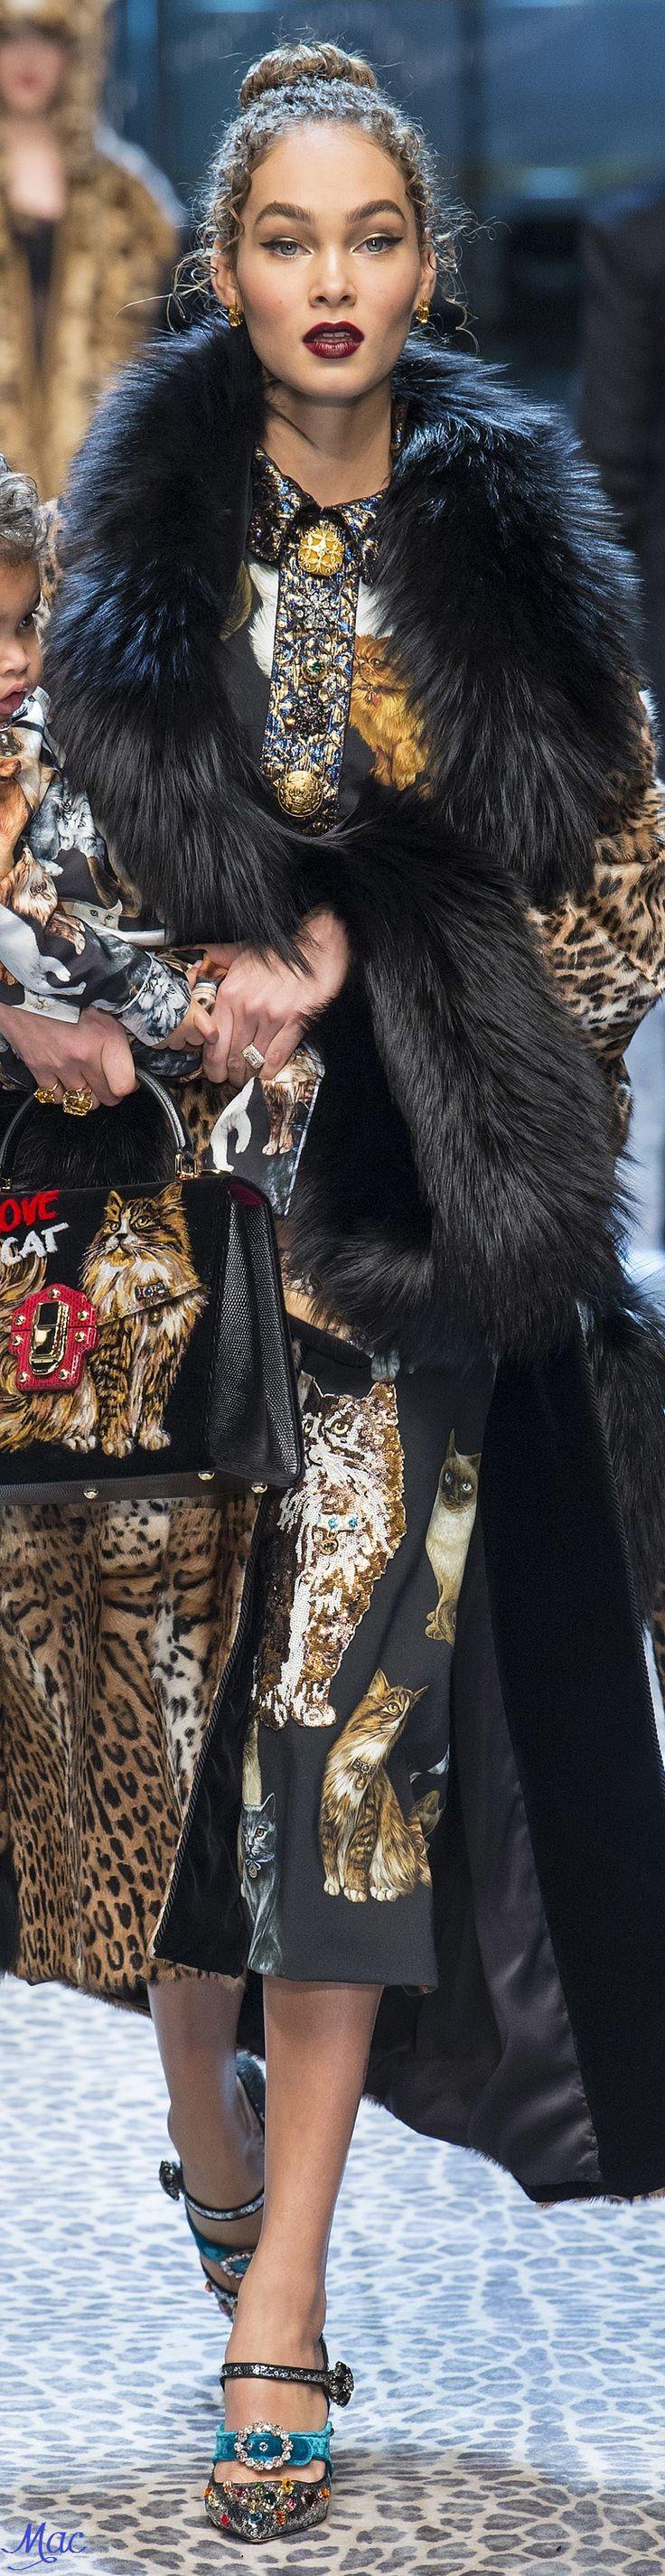 Rosamaria G Frangini | BlackKaleidoscope |  Fall 2017 RTW Dolce & Gabbana